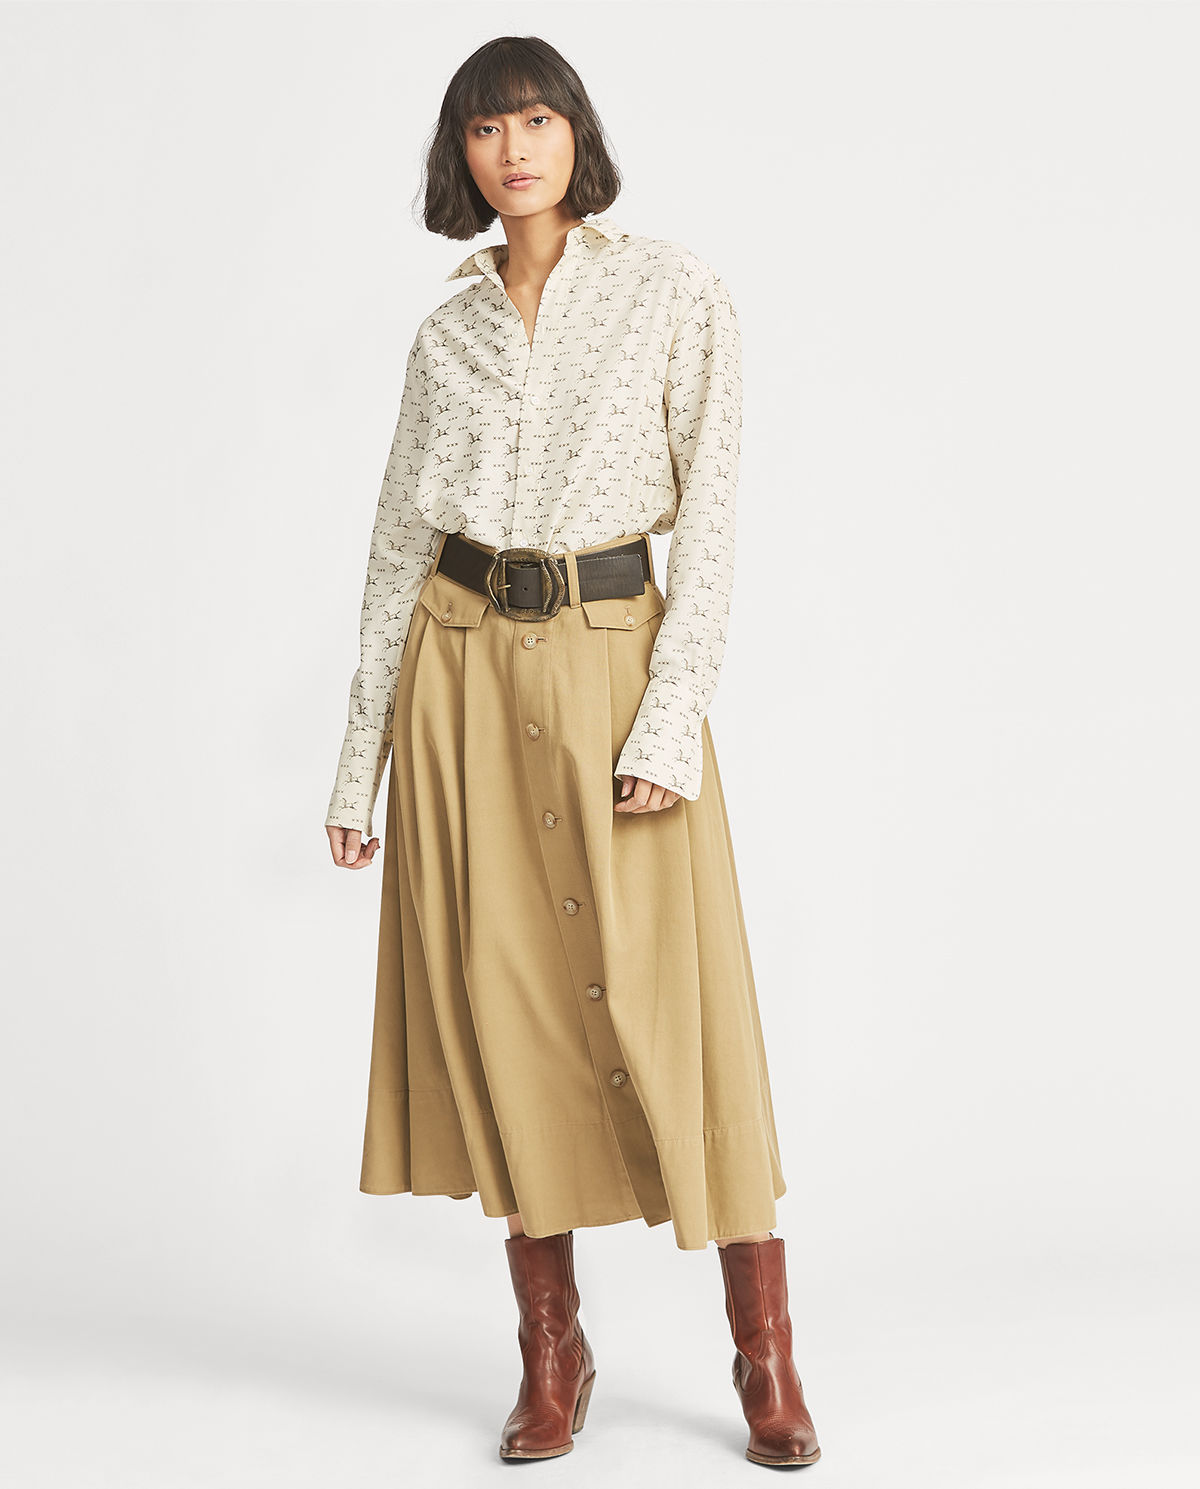 modelka polo ralph lauren spódnica